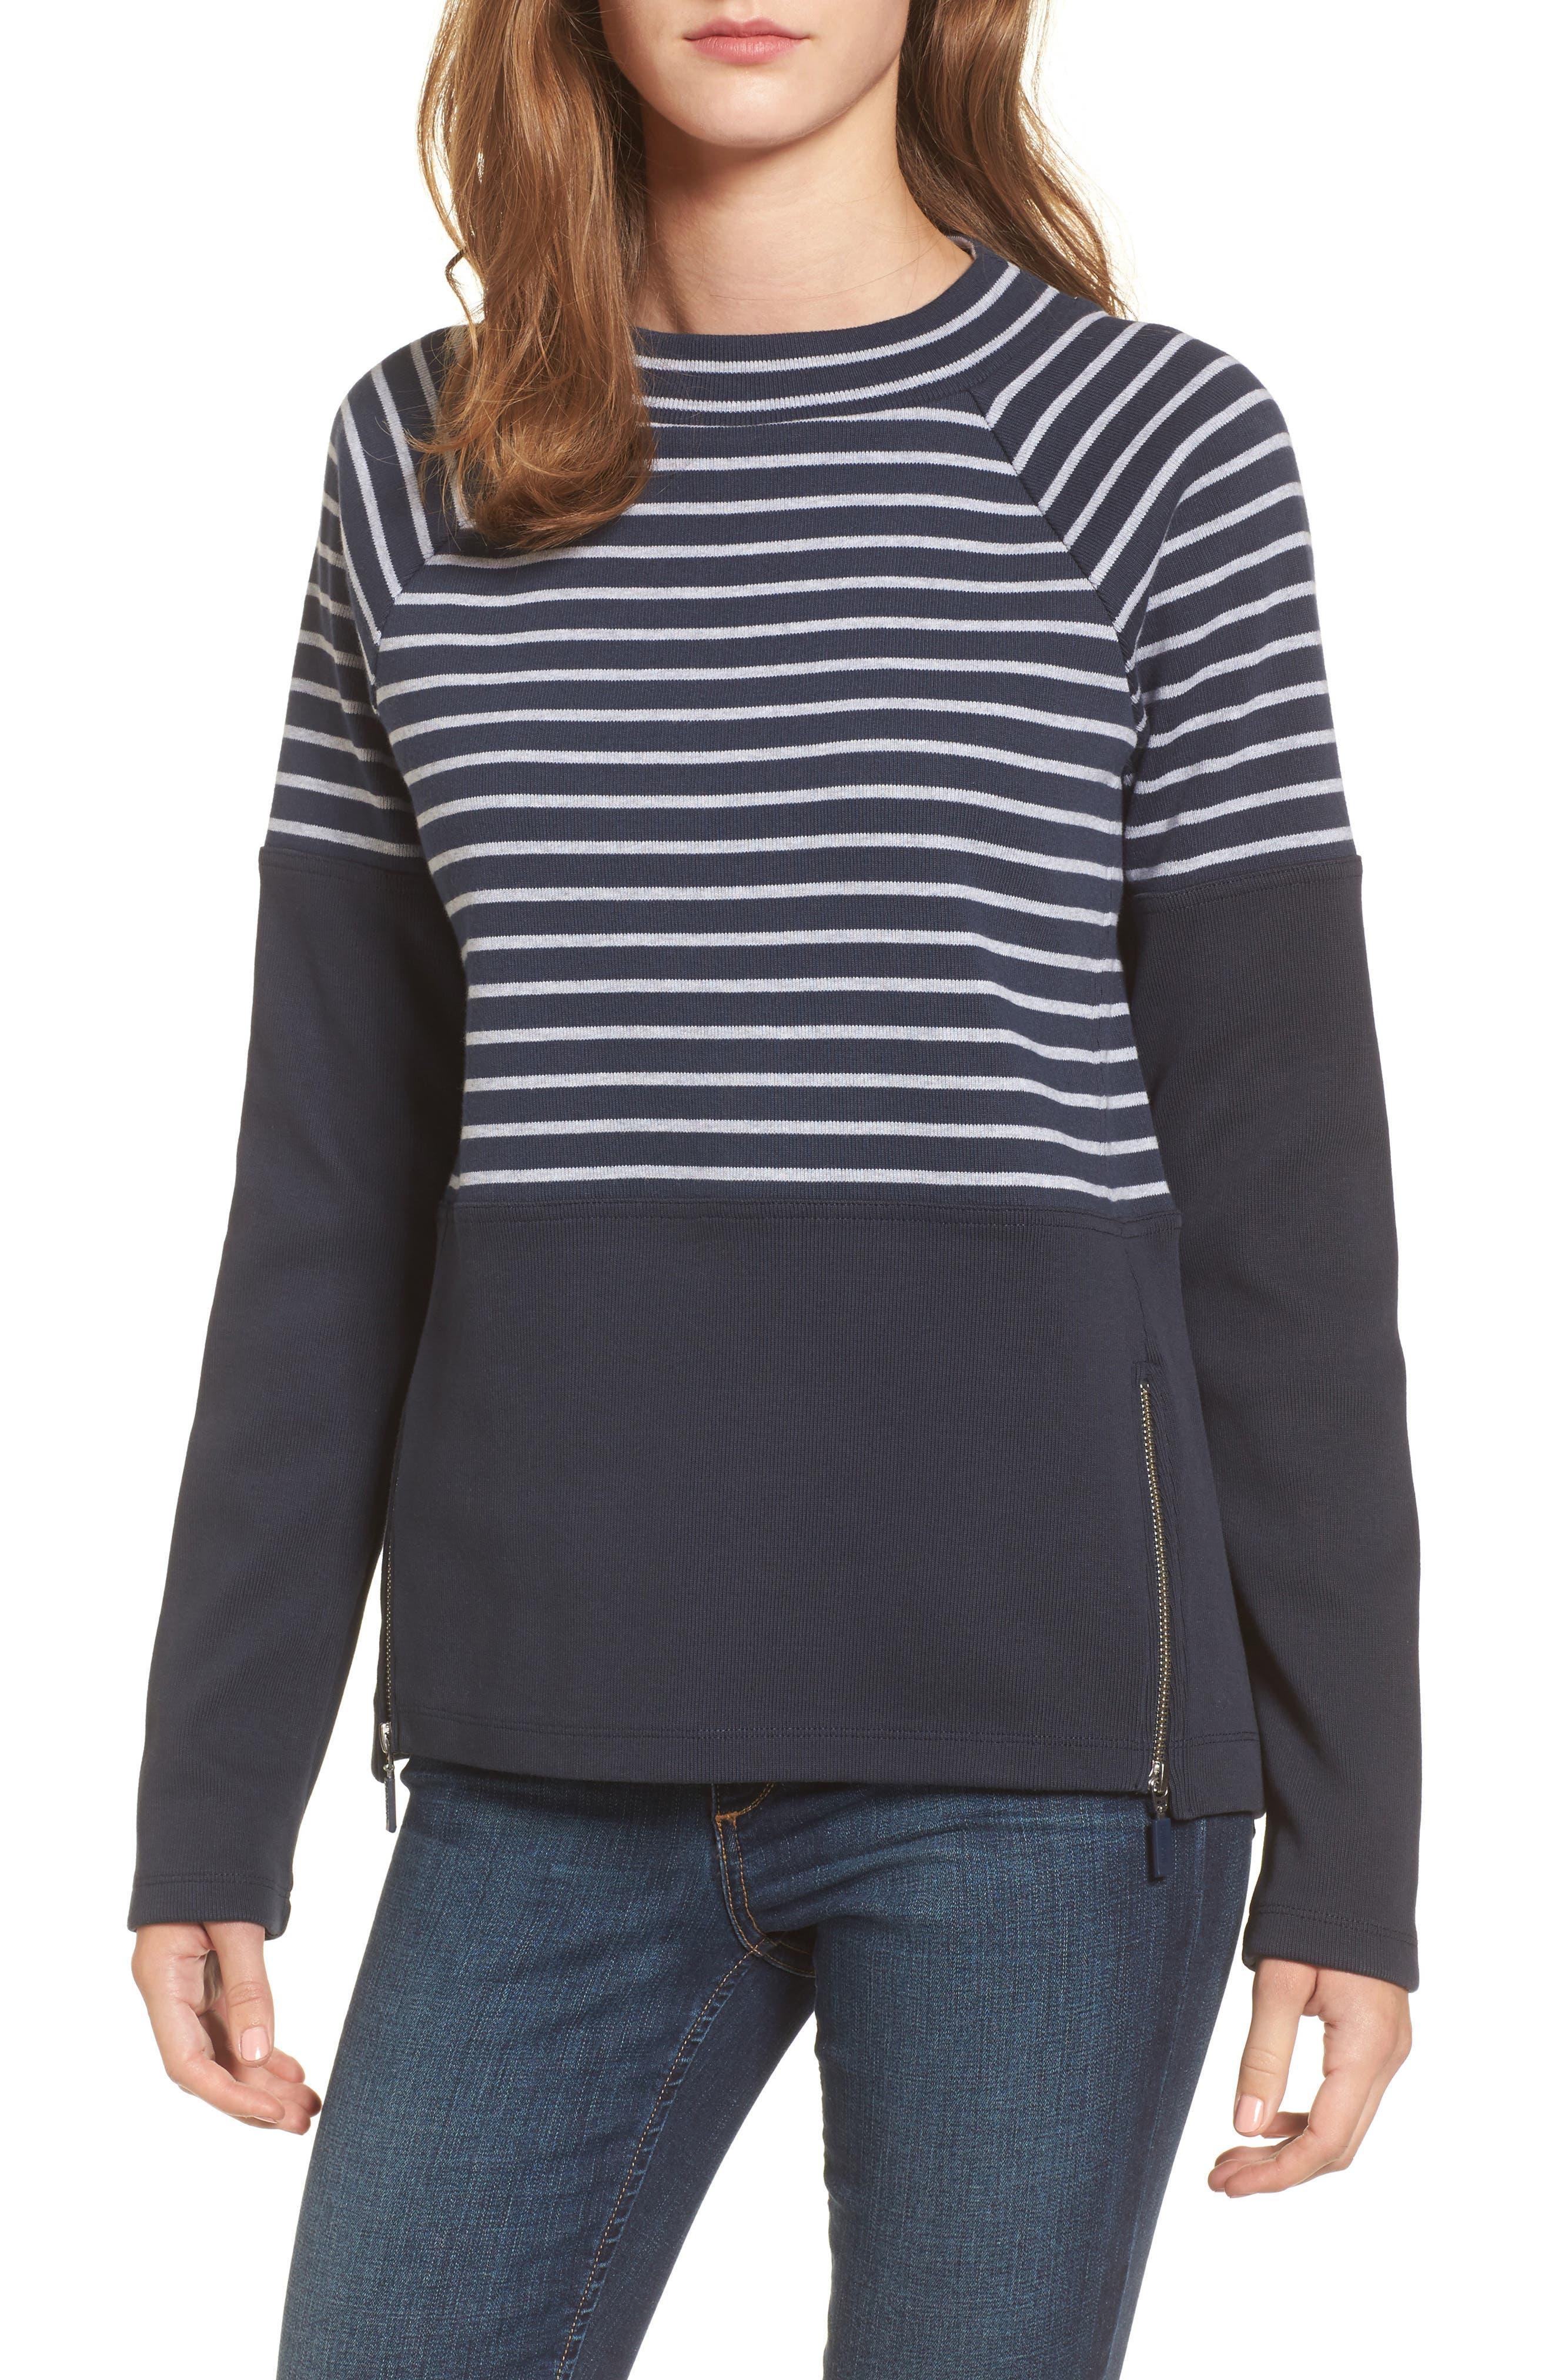 Seaburn Stripe Sweatshirt,                         Main,                         color, Navy/ Grey